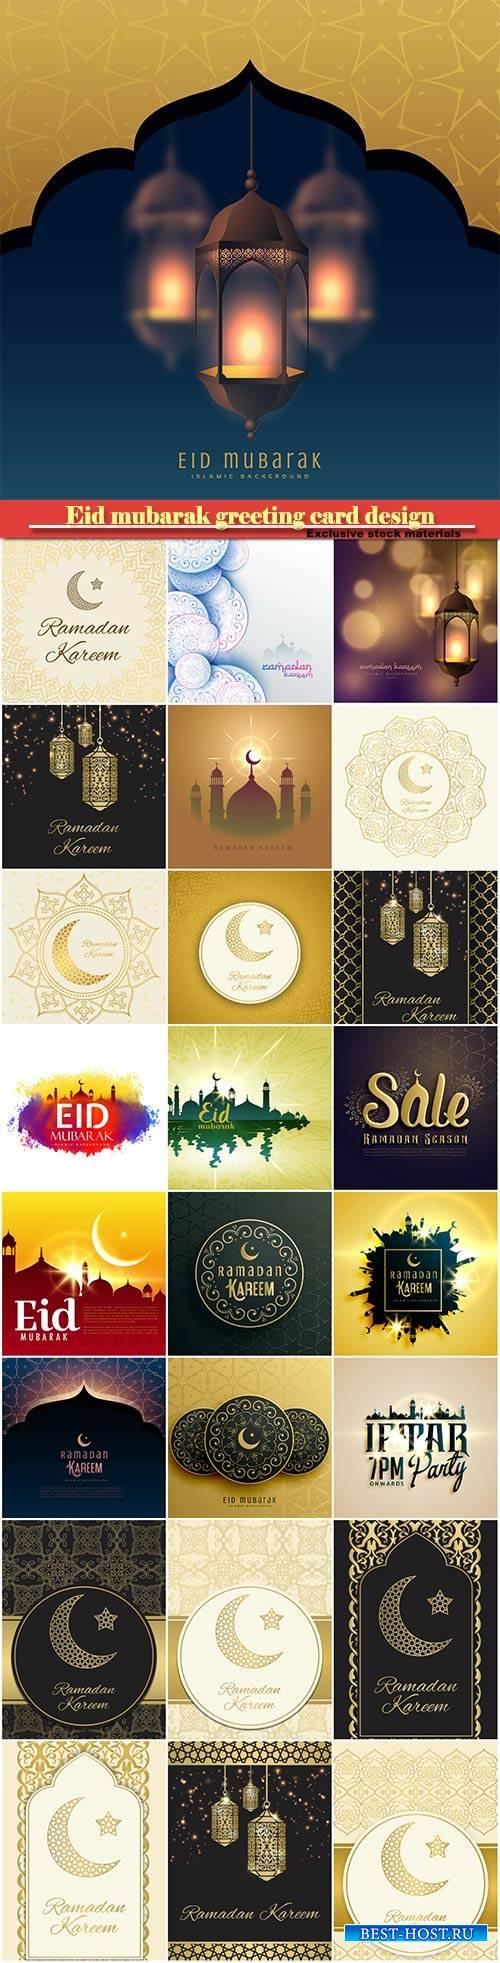 Eid mubarak greeting card design in islamic decoration, ramadan kareem vector card